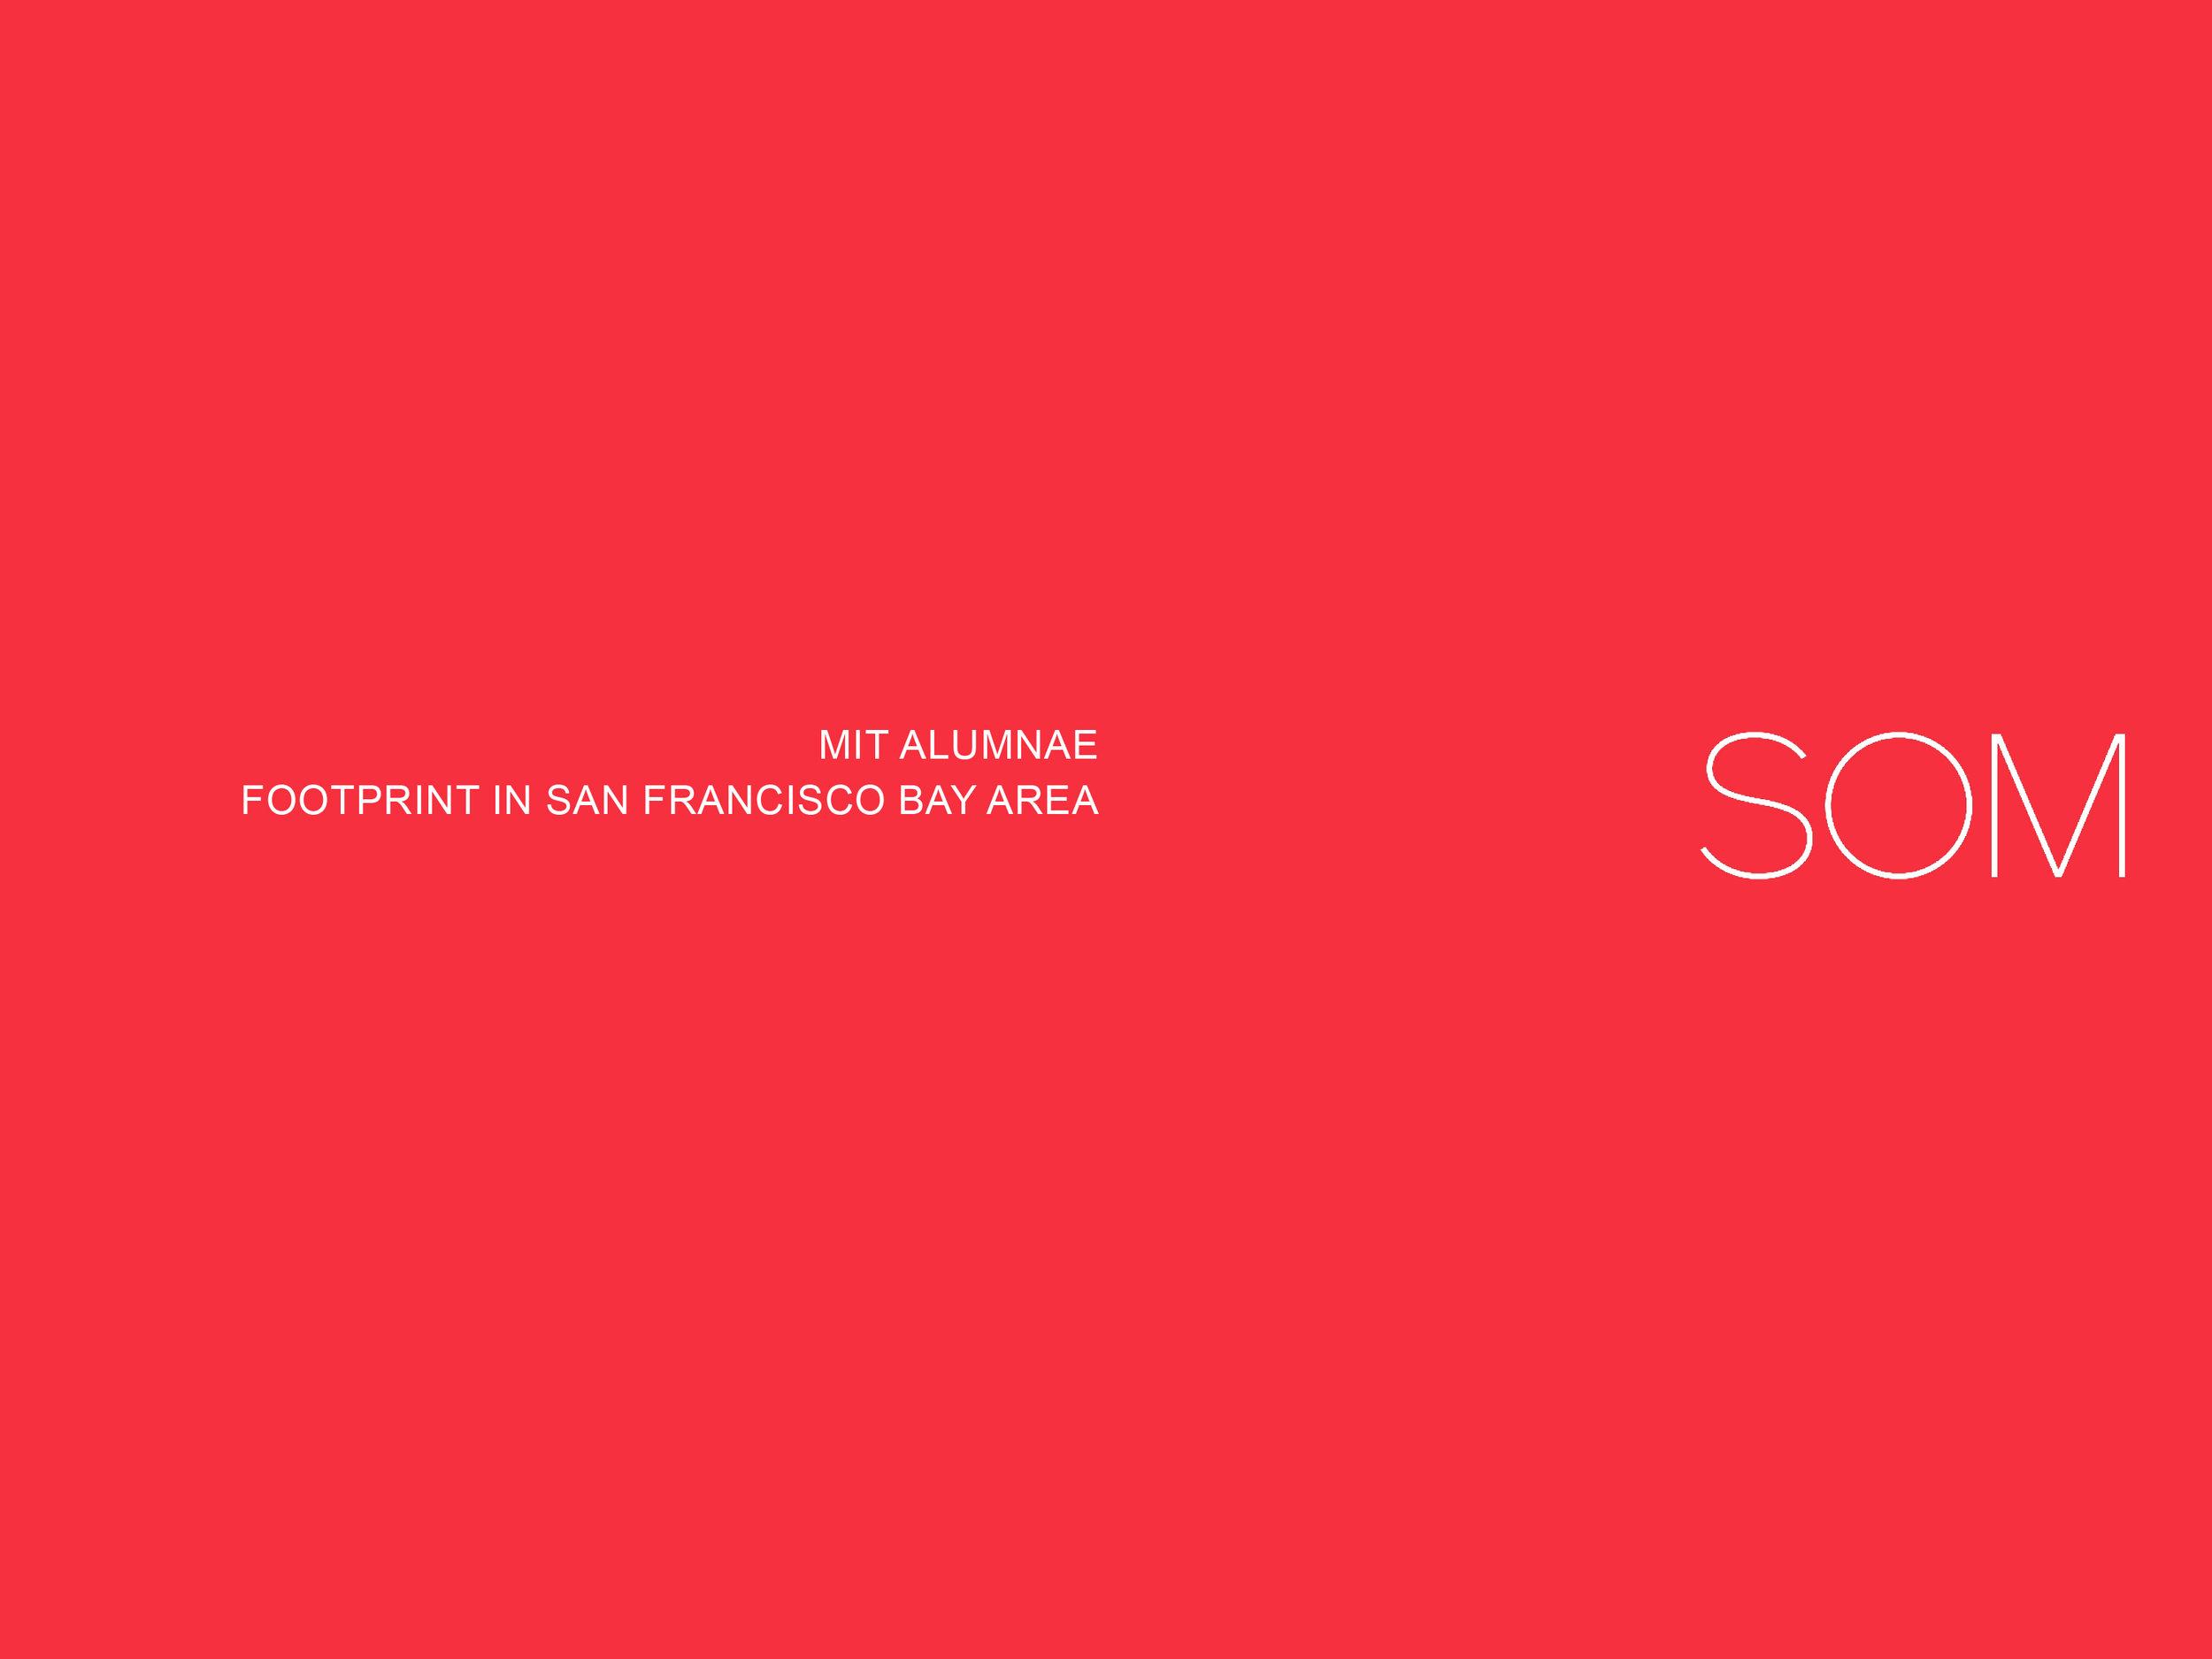 MIT ARCHITECTURE 150 SAN FRANCISCO SLIDESHOW-91 copy.jpg